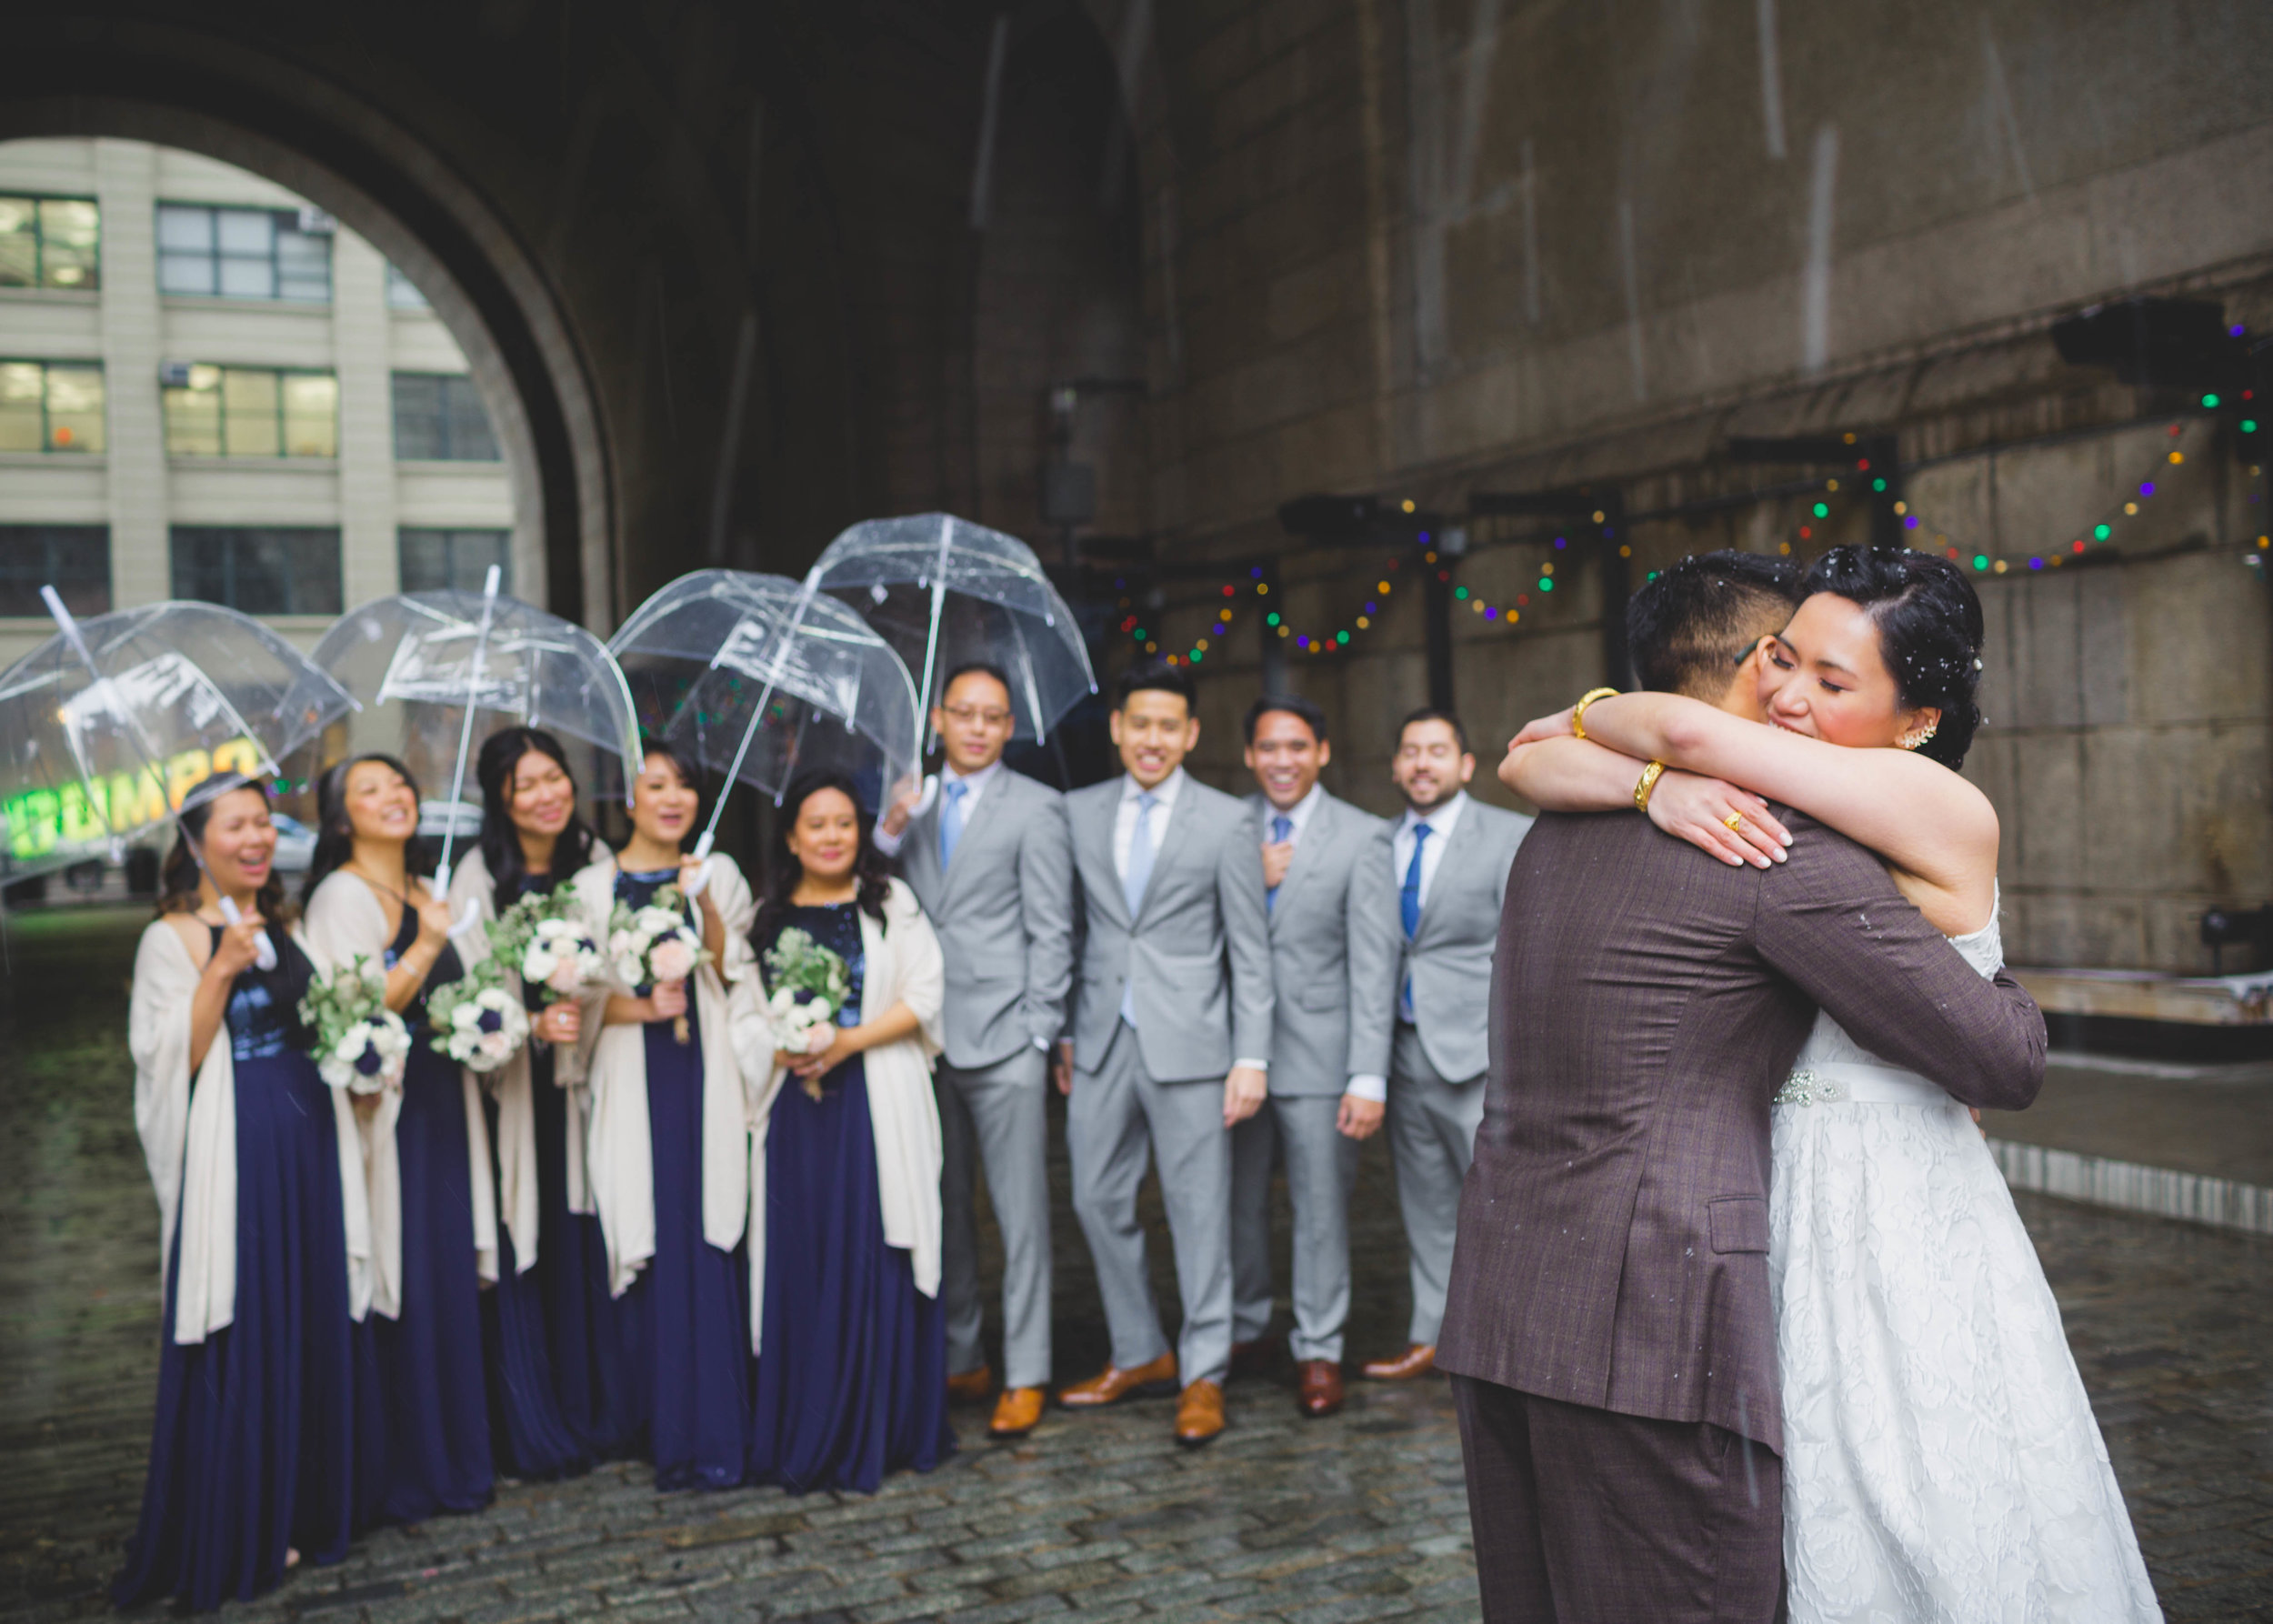 DUMBO December Wedding 2017 Under Manhattan Bridge Snow (12 of 23) copy.jpg